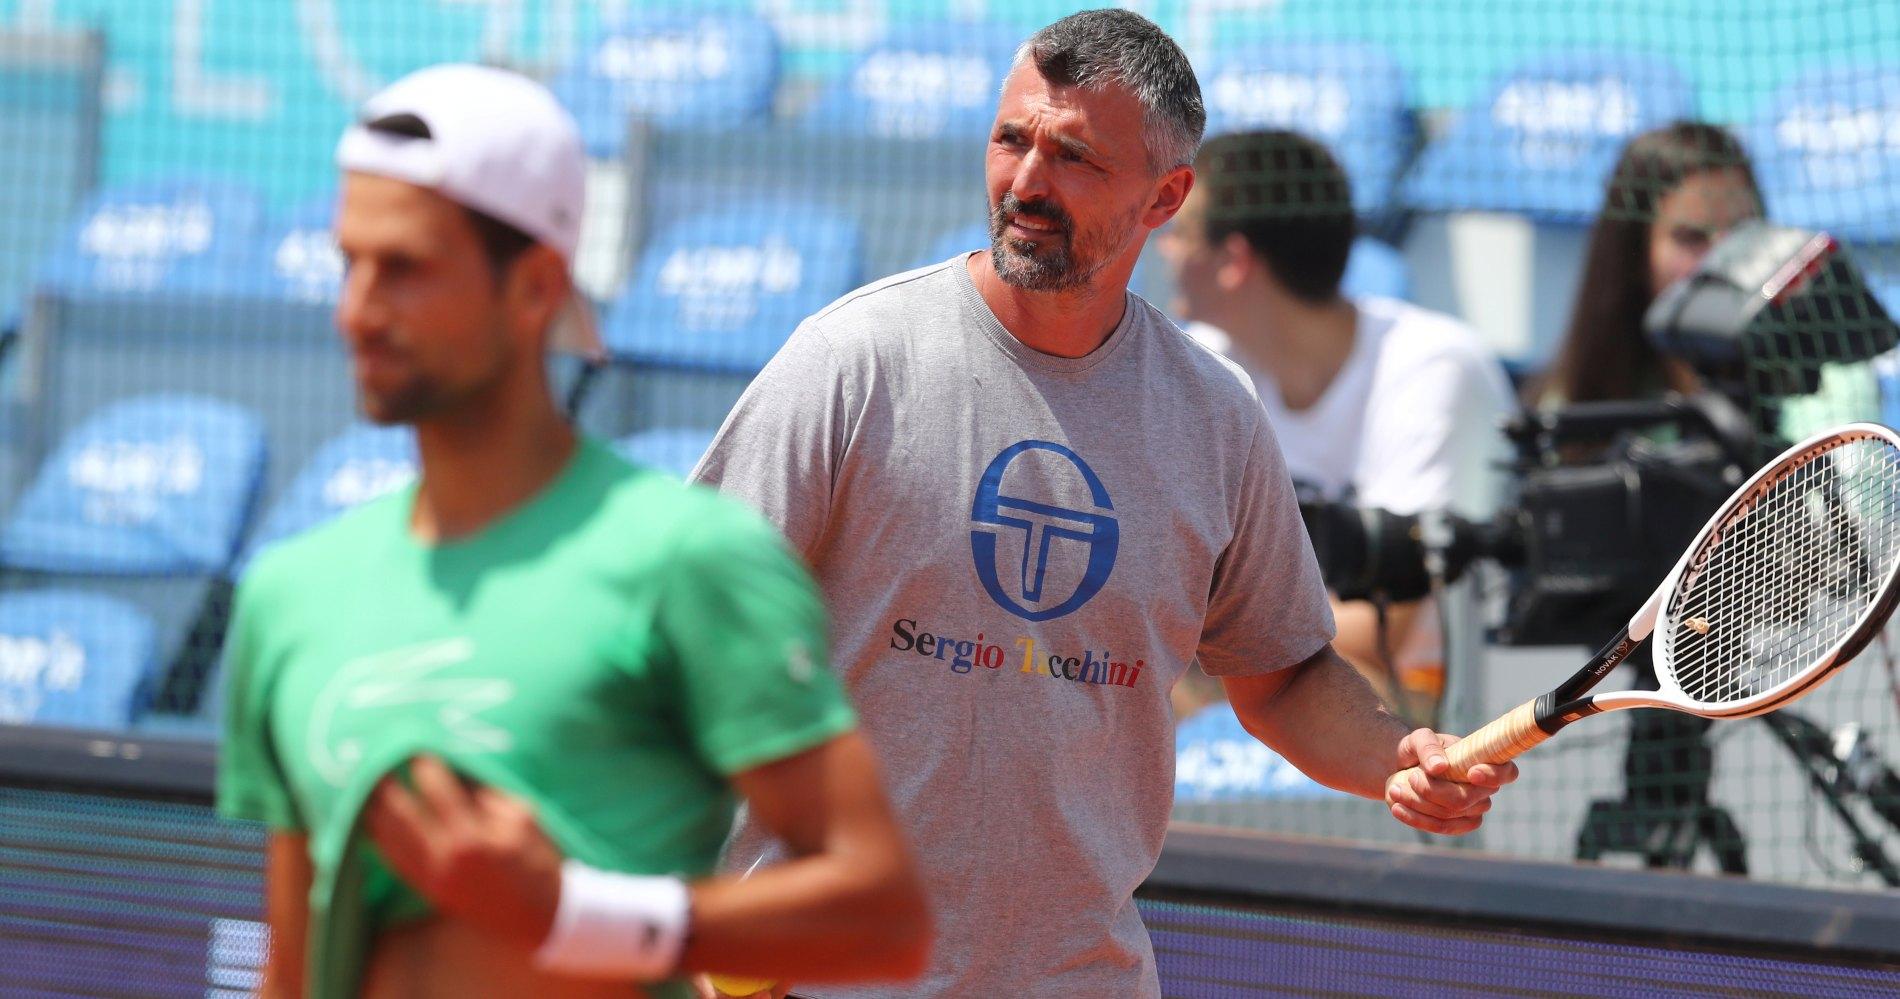 Goran Ivanisevic, Adria Tour 2020